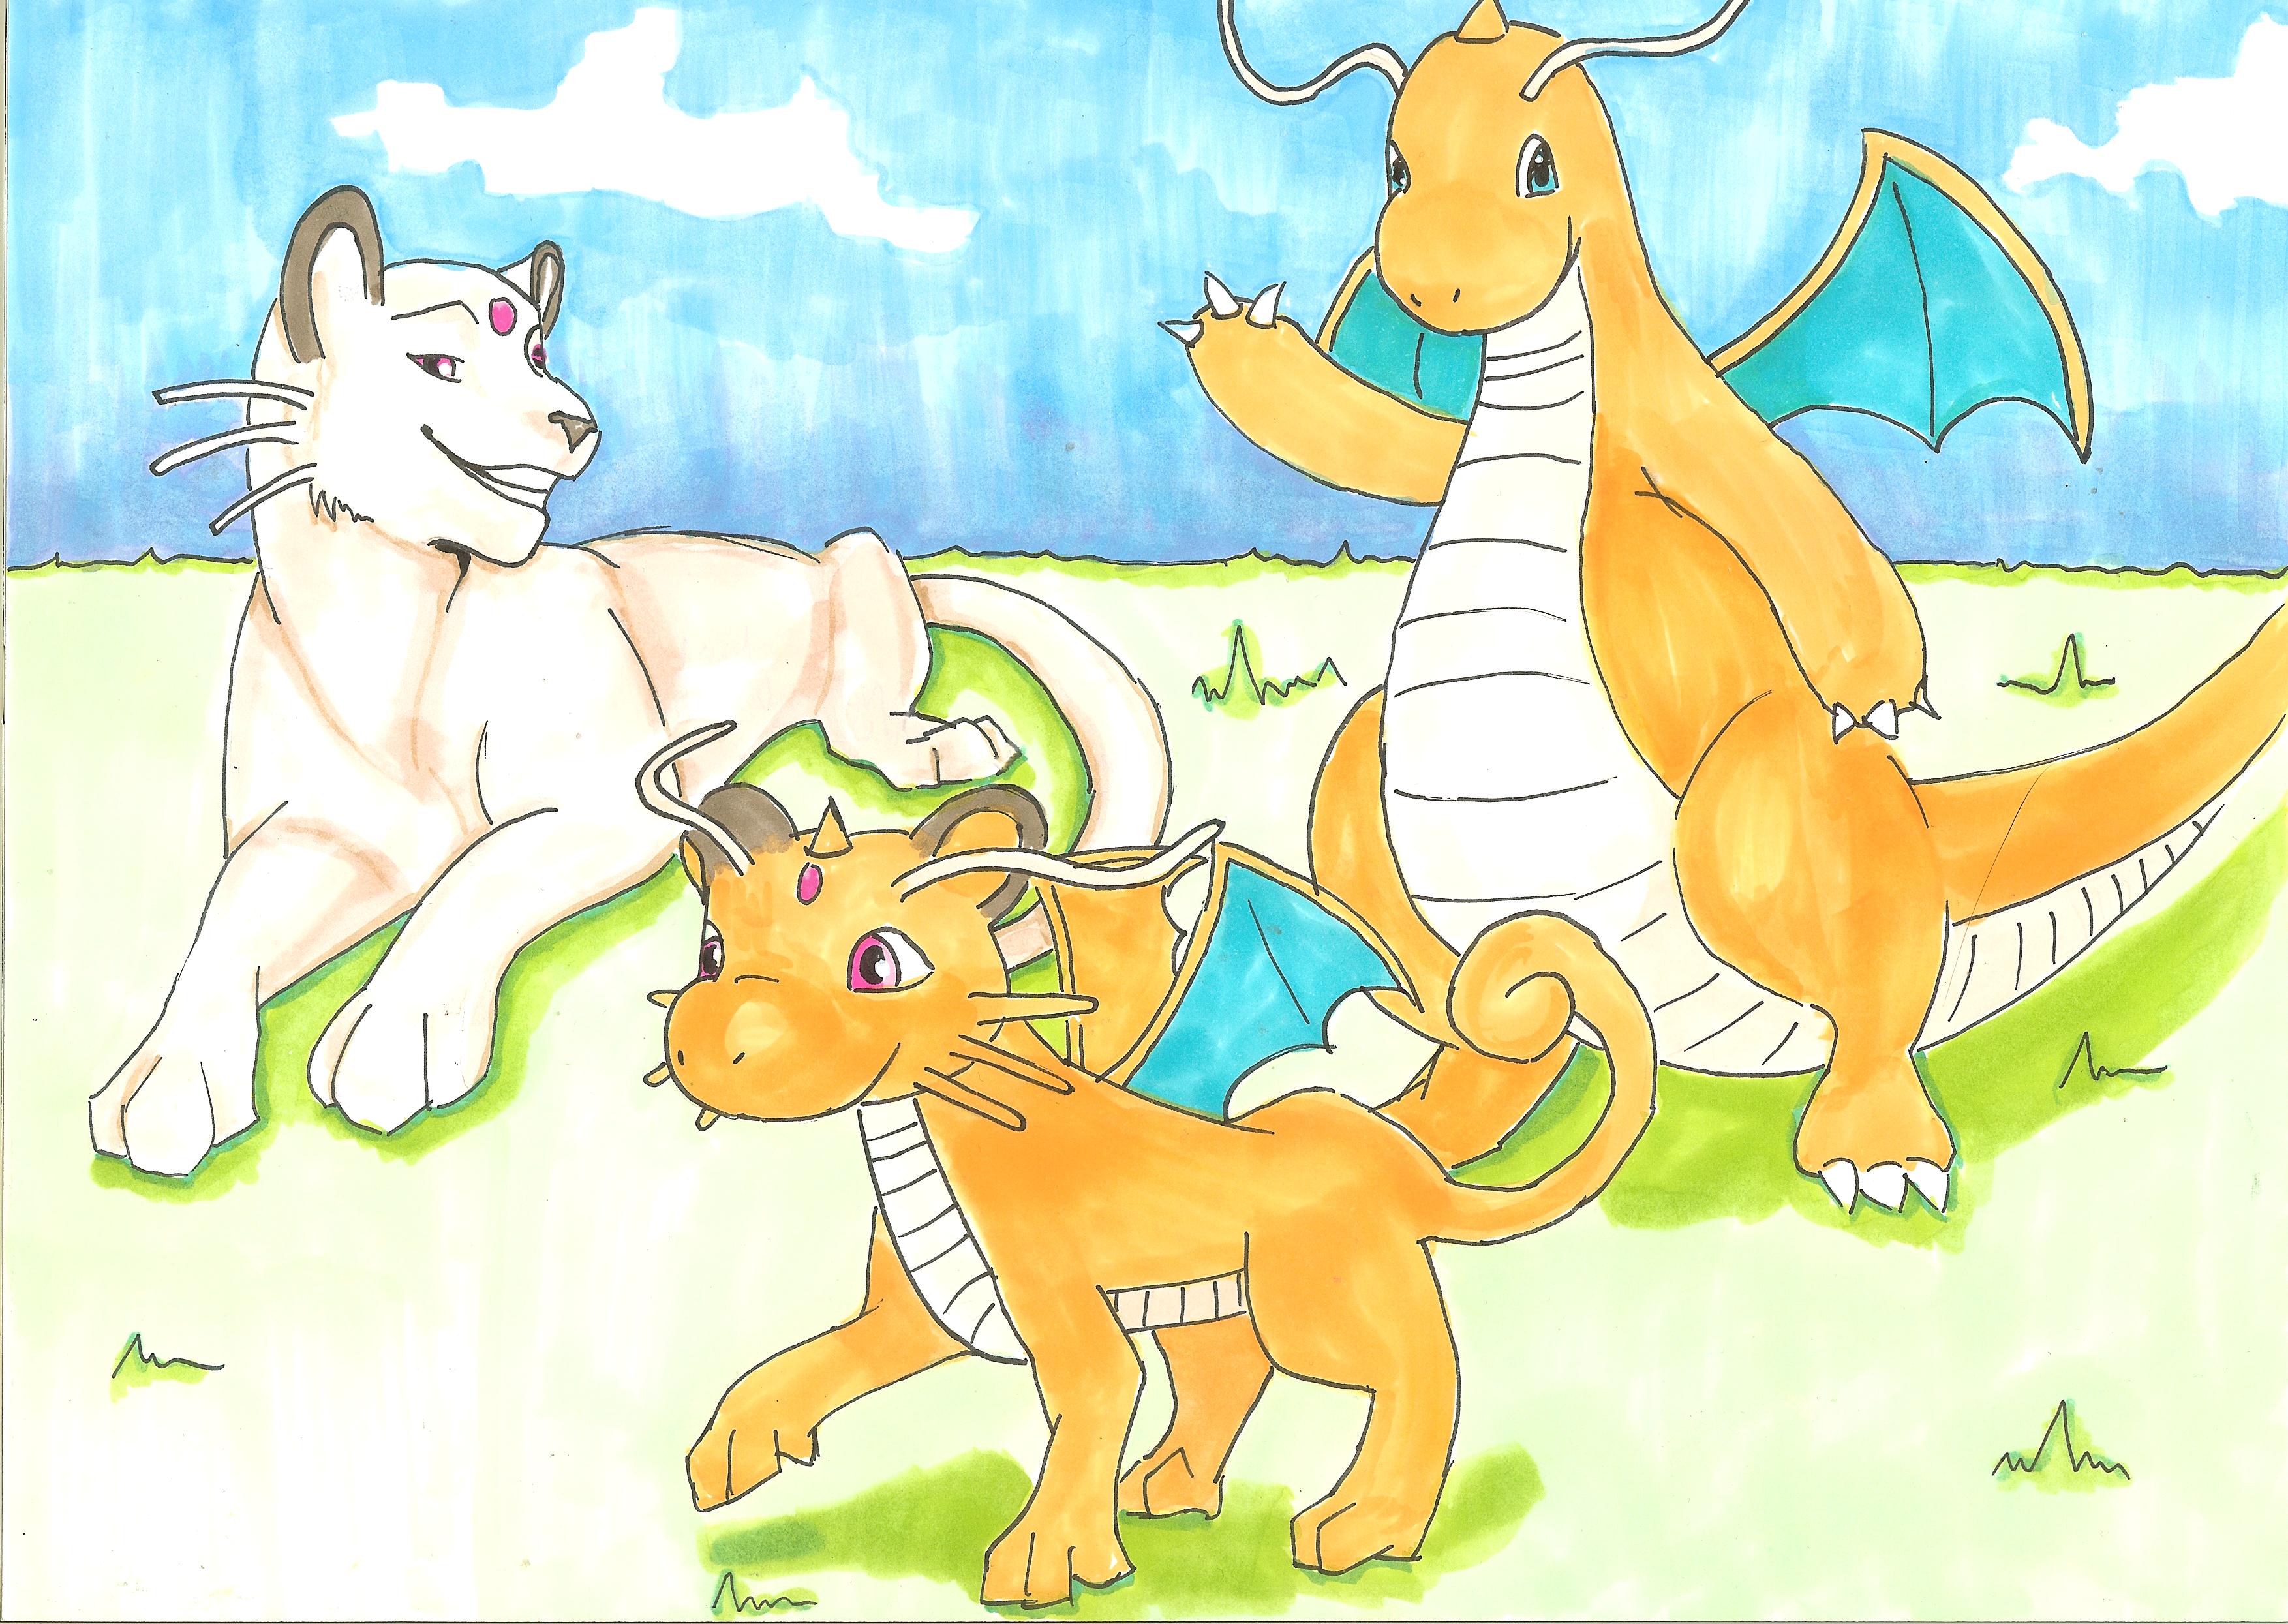 Persian and Dragonite wave their Dragonsian goodbye